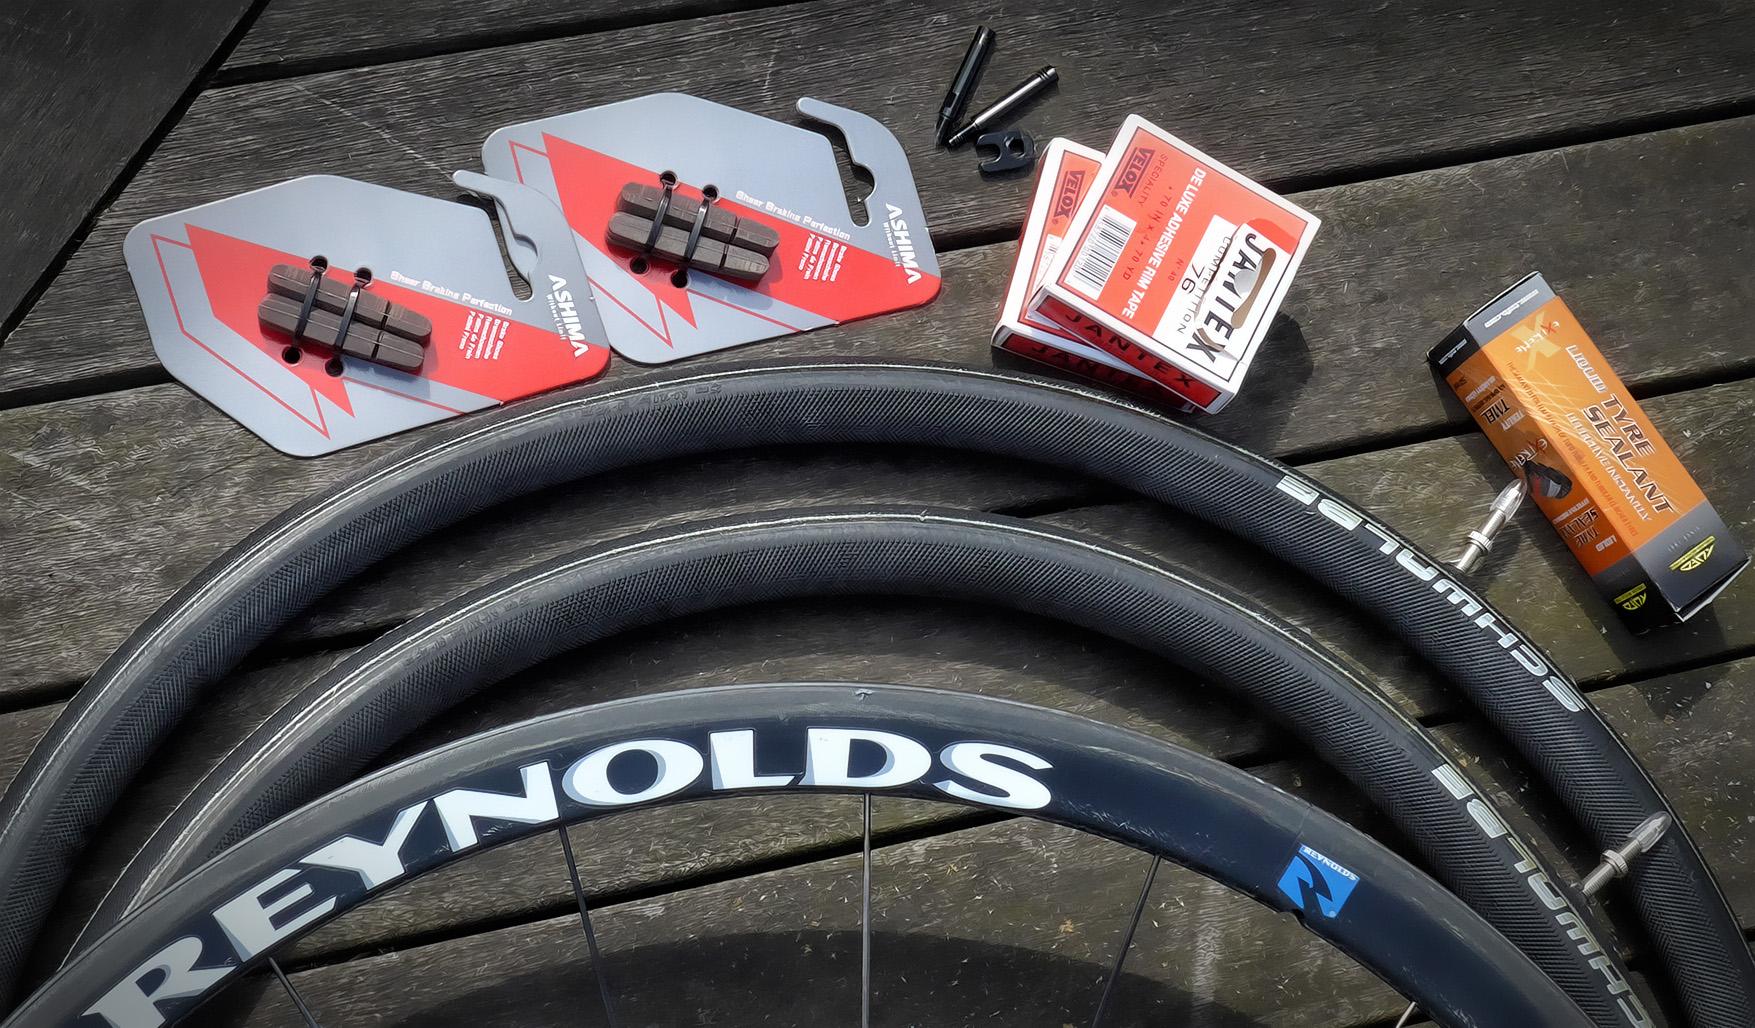 Wheel bits